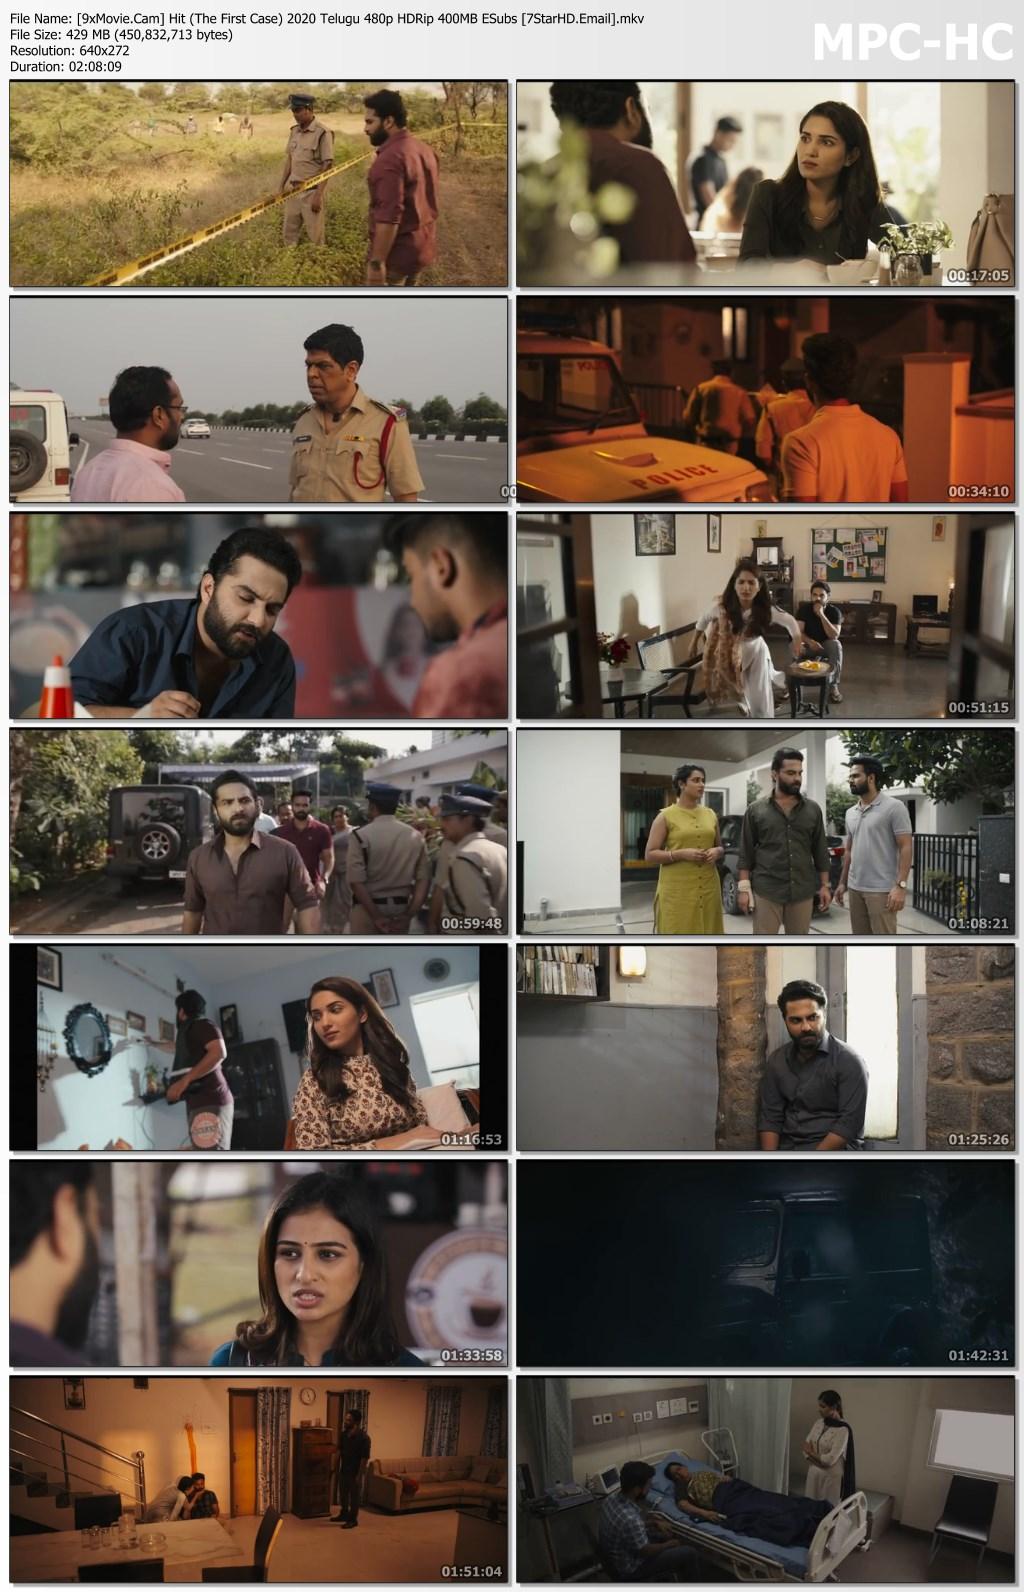 Hit (The First Case) 2020 Telugu 480p HDRip x264 400MB ESubs